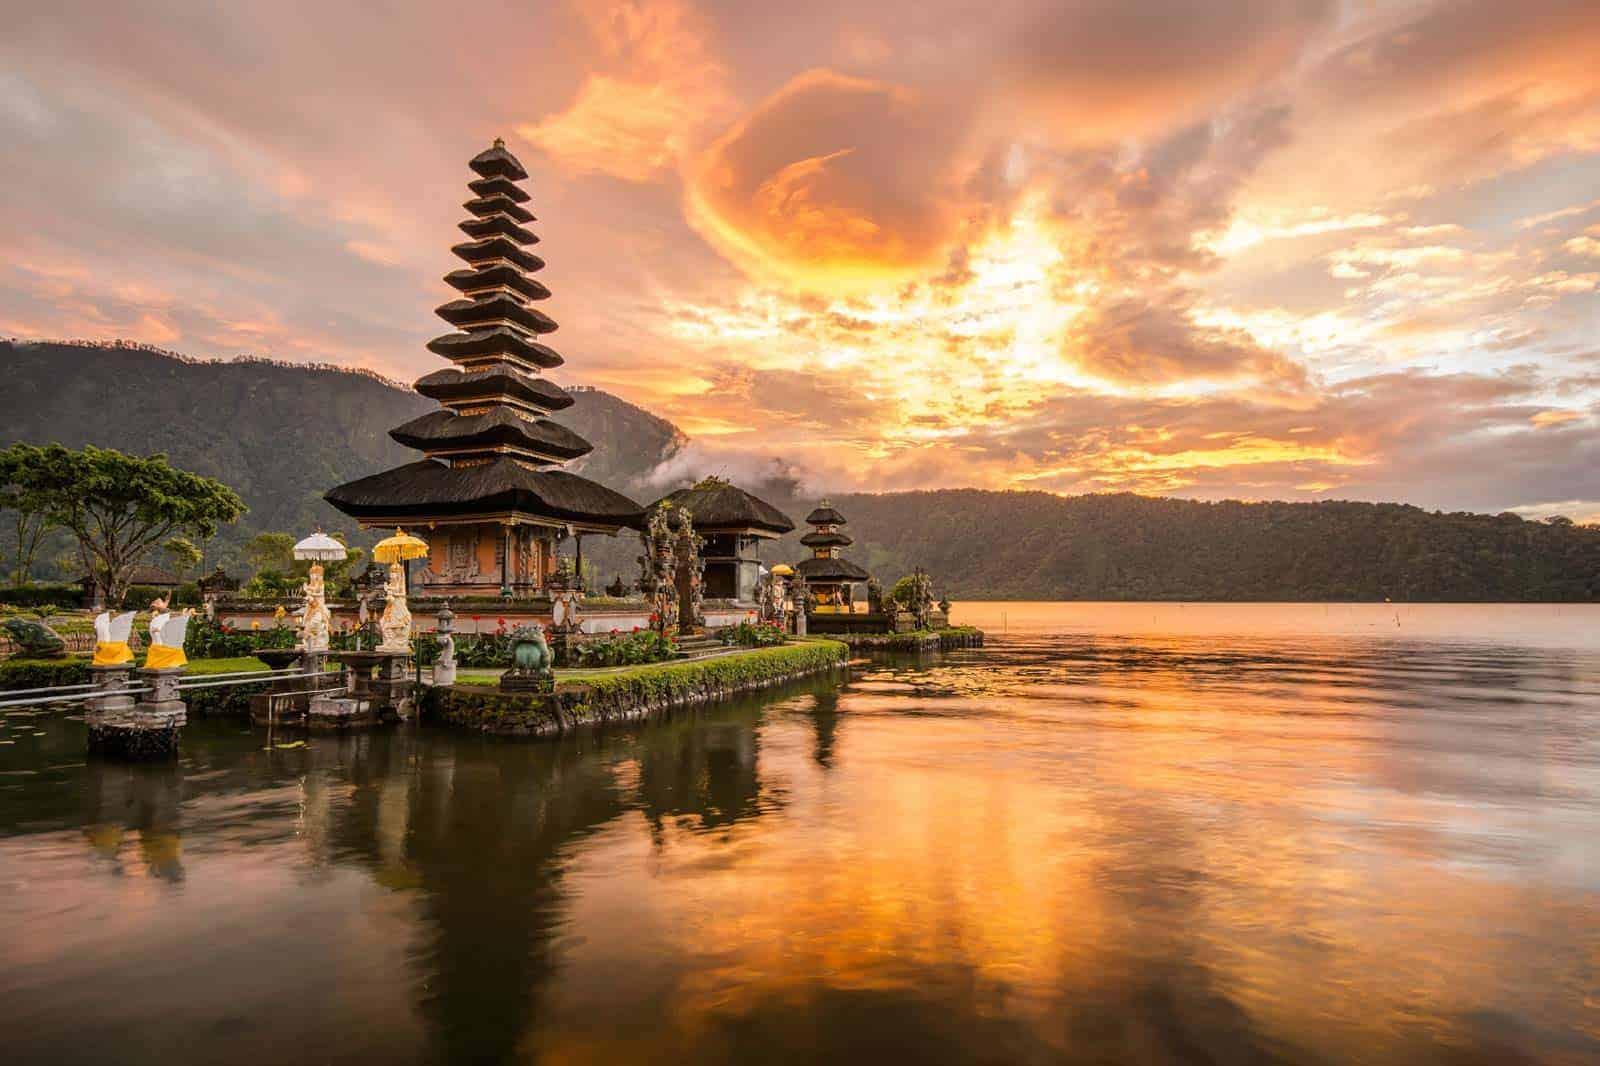 Templo em Bali, Indonésia